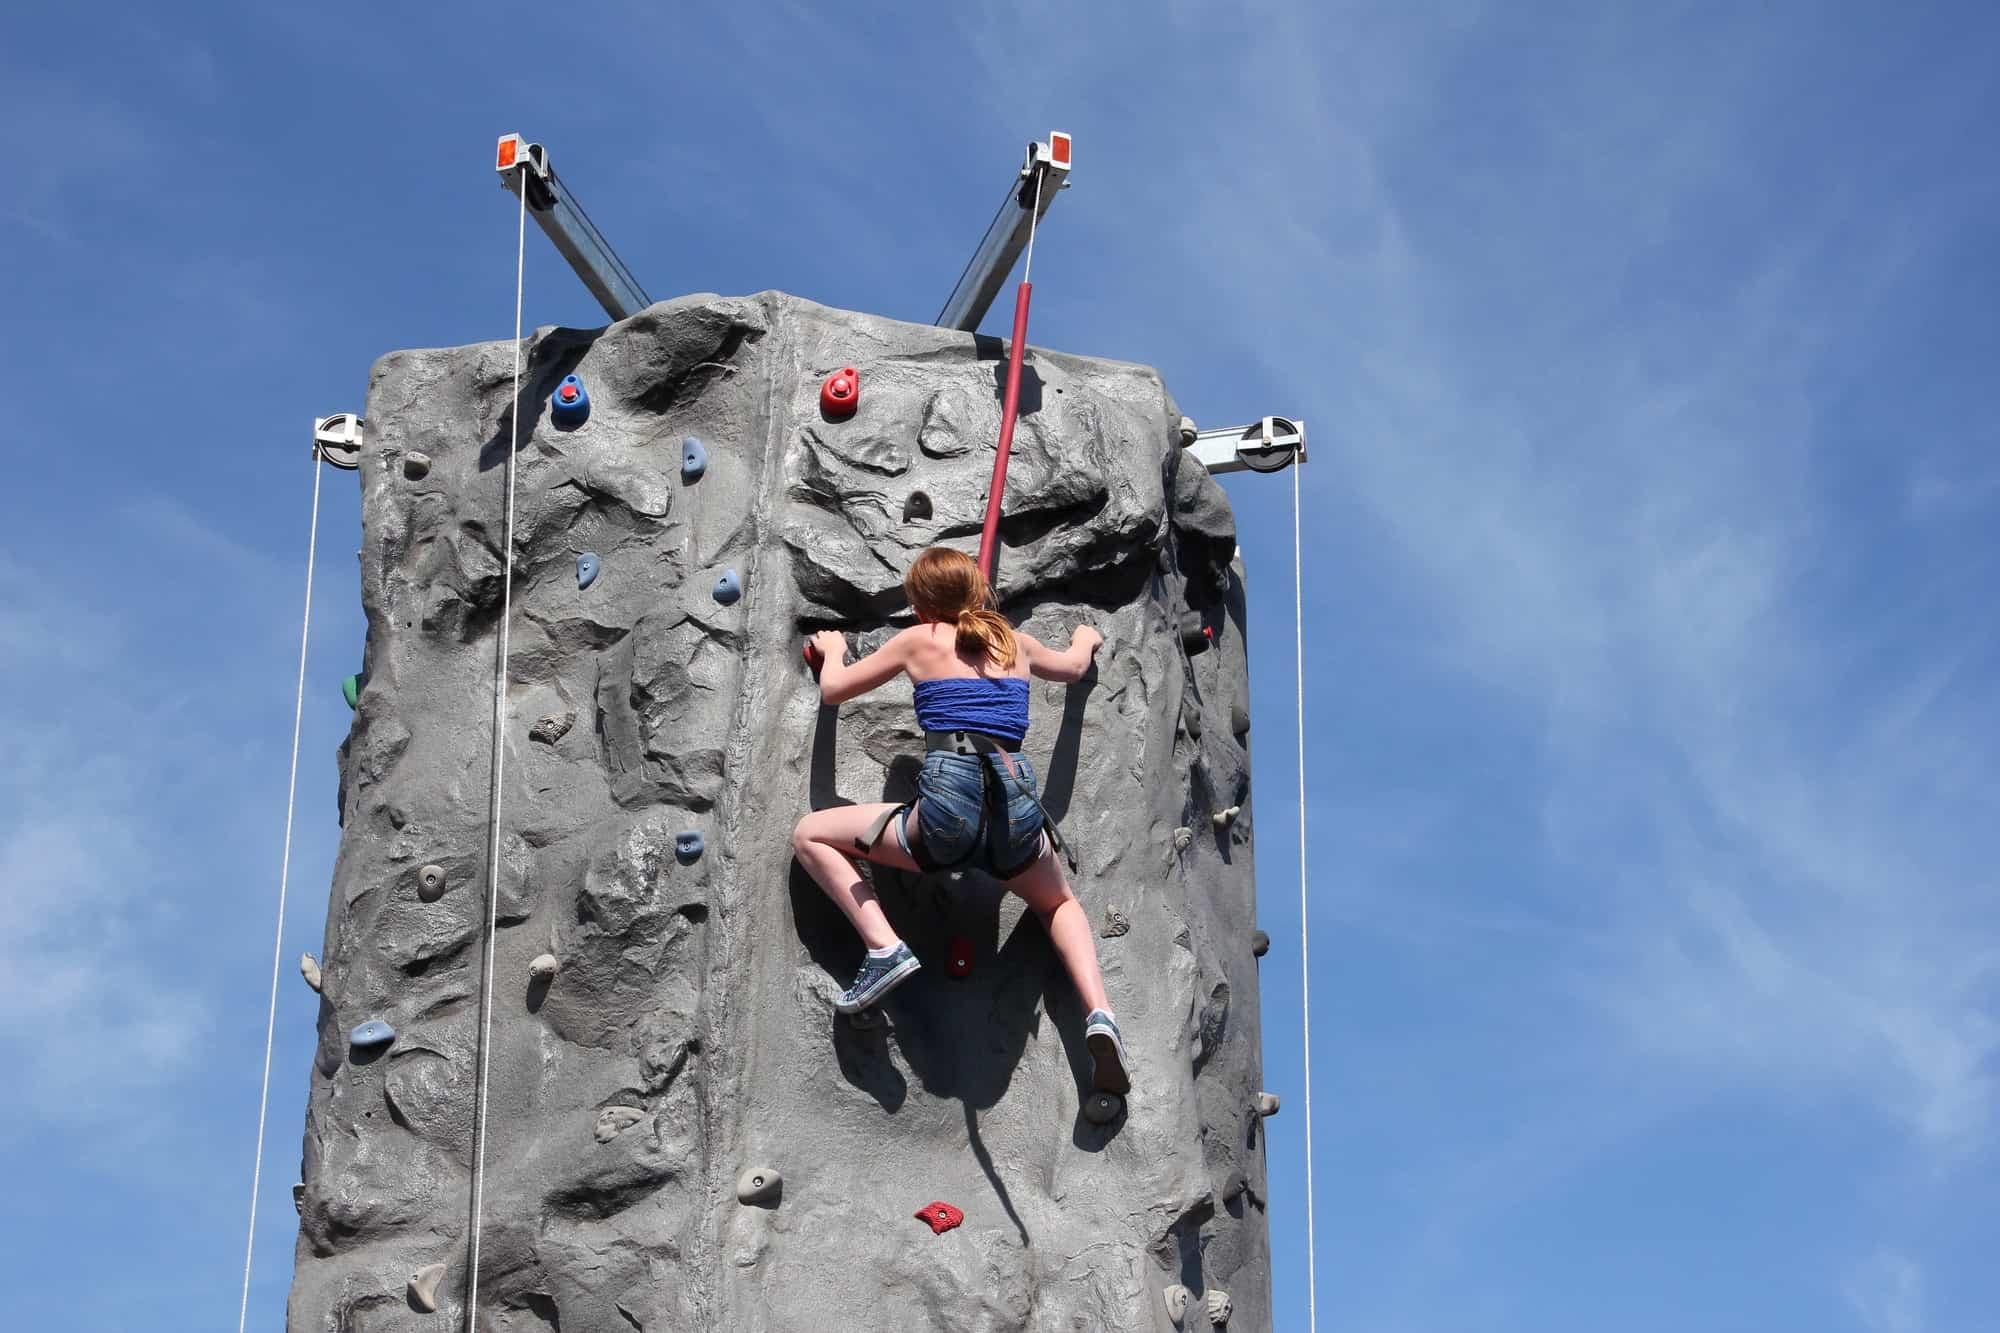 Innovative Leisure Climbing Mobile Climbing Walls